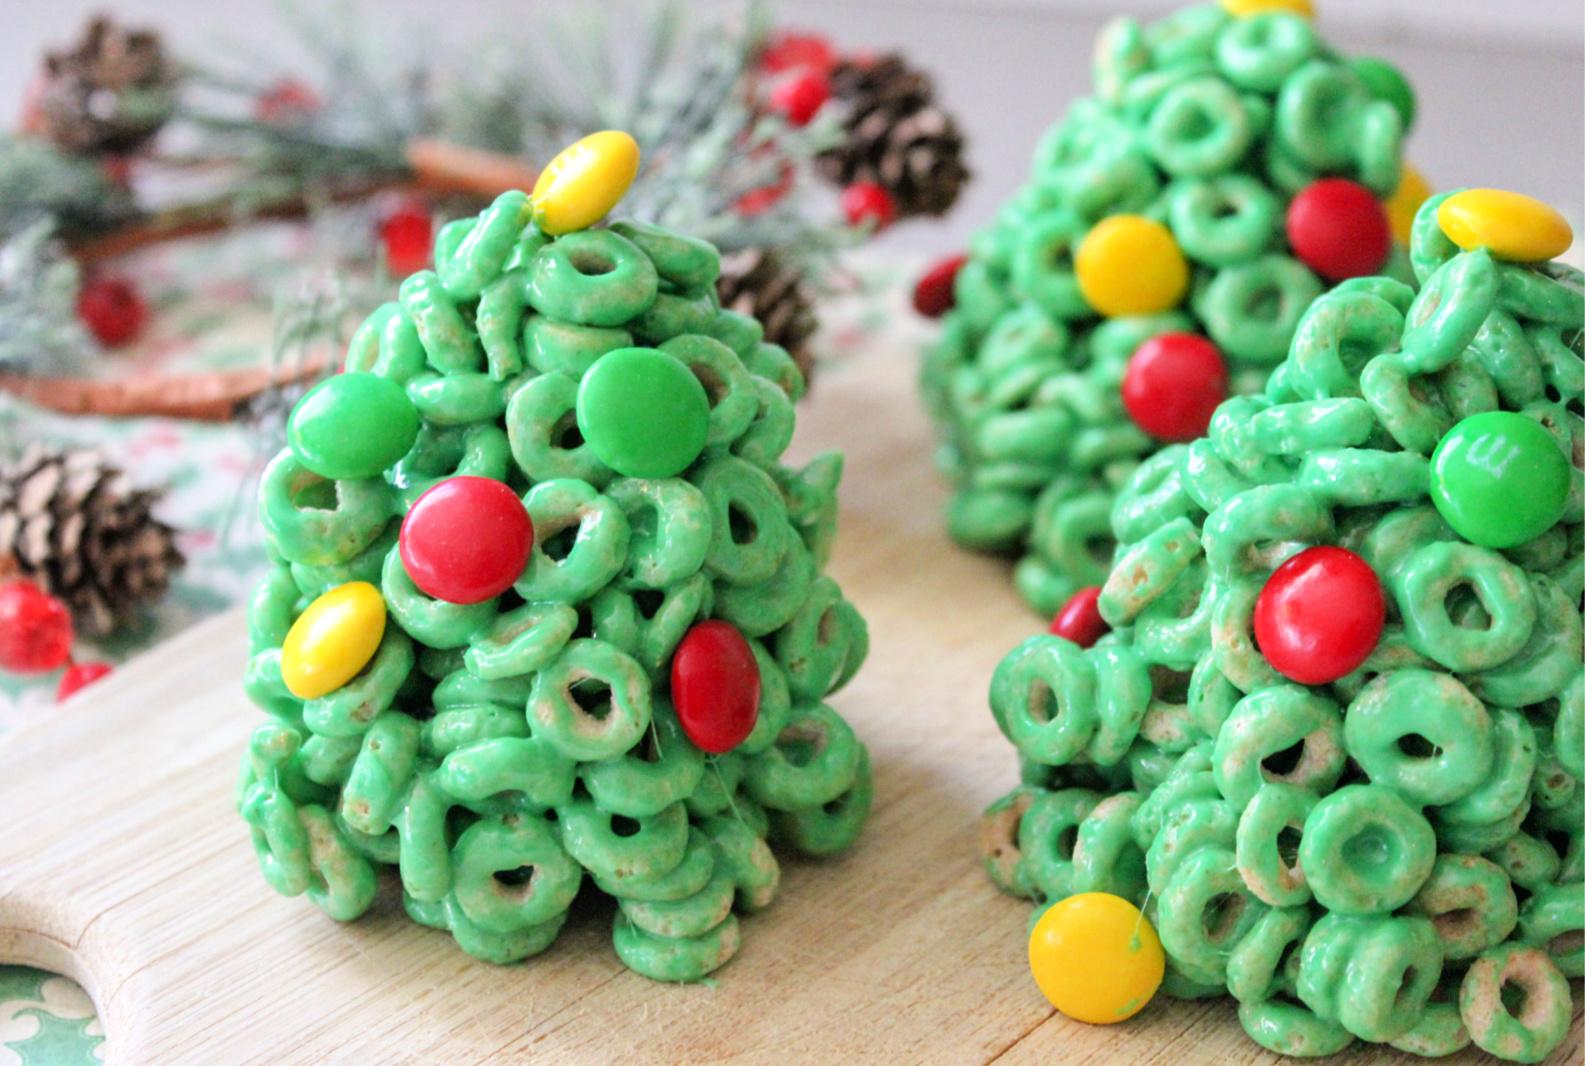 Cheerios Christmas Trees Recipe from 5DollarDinners.com